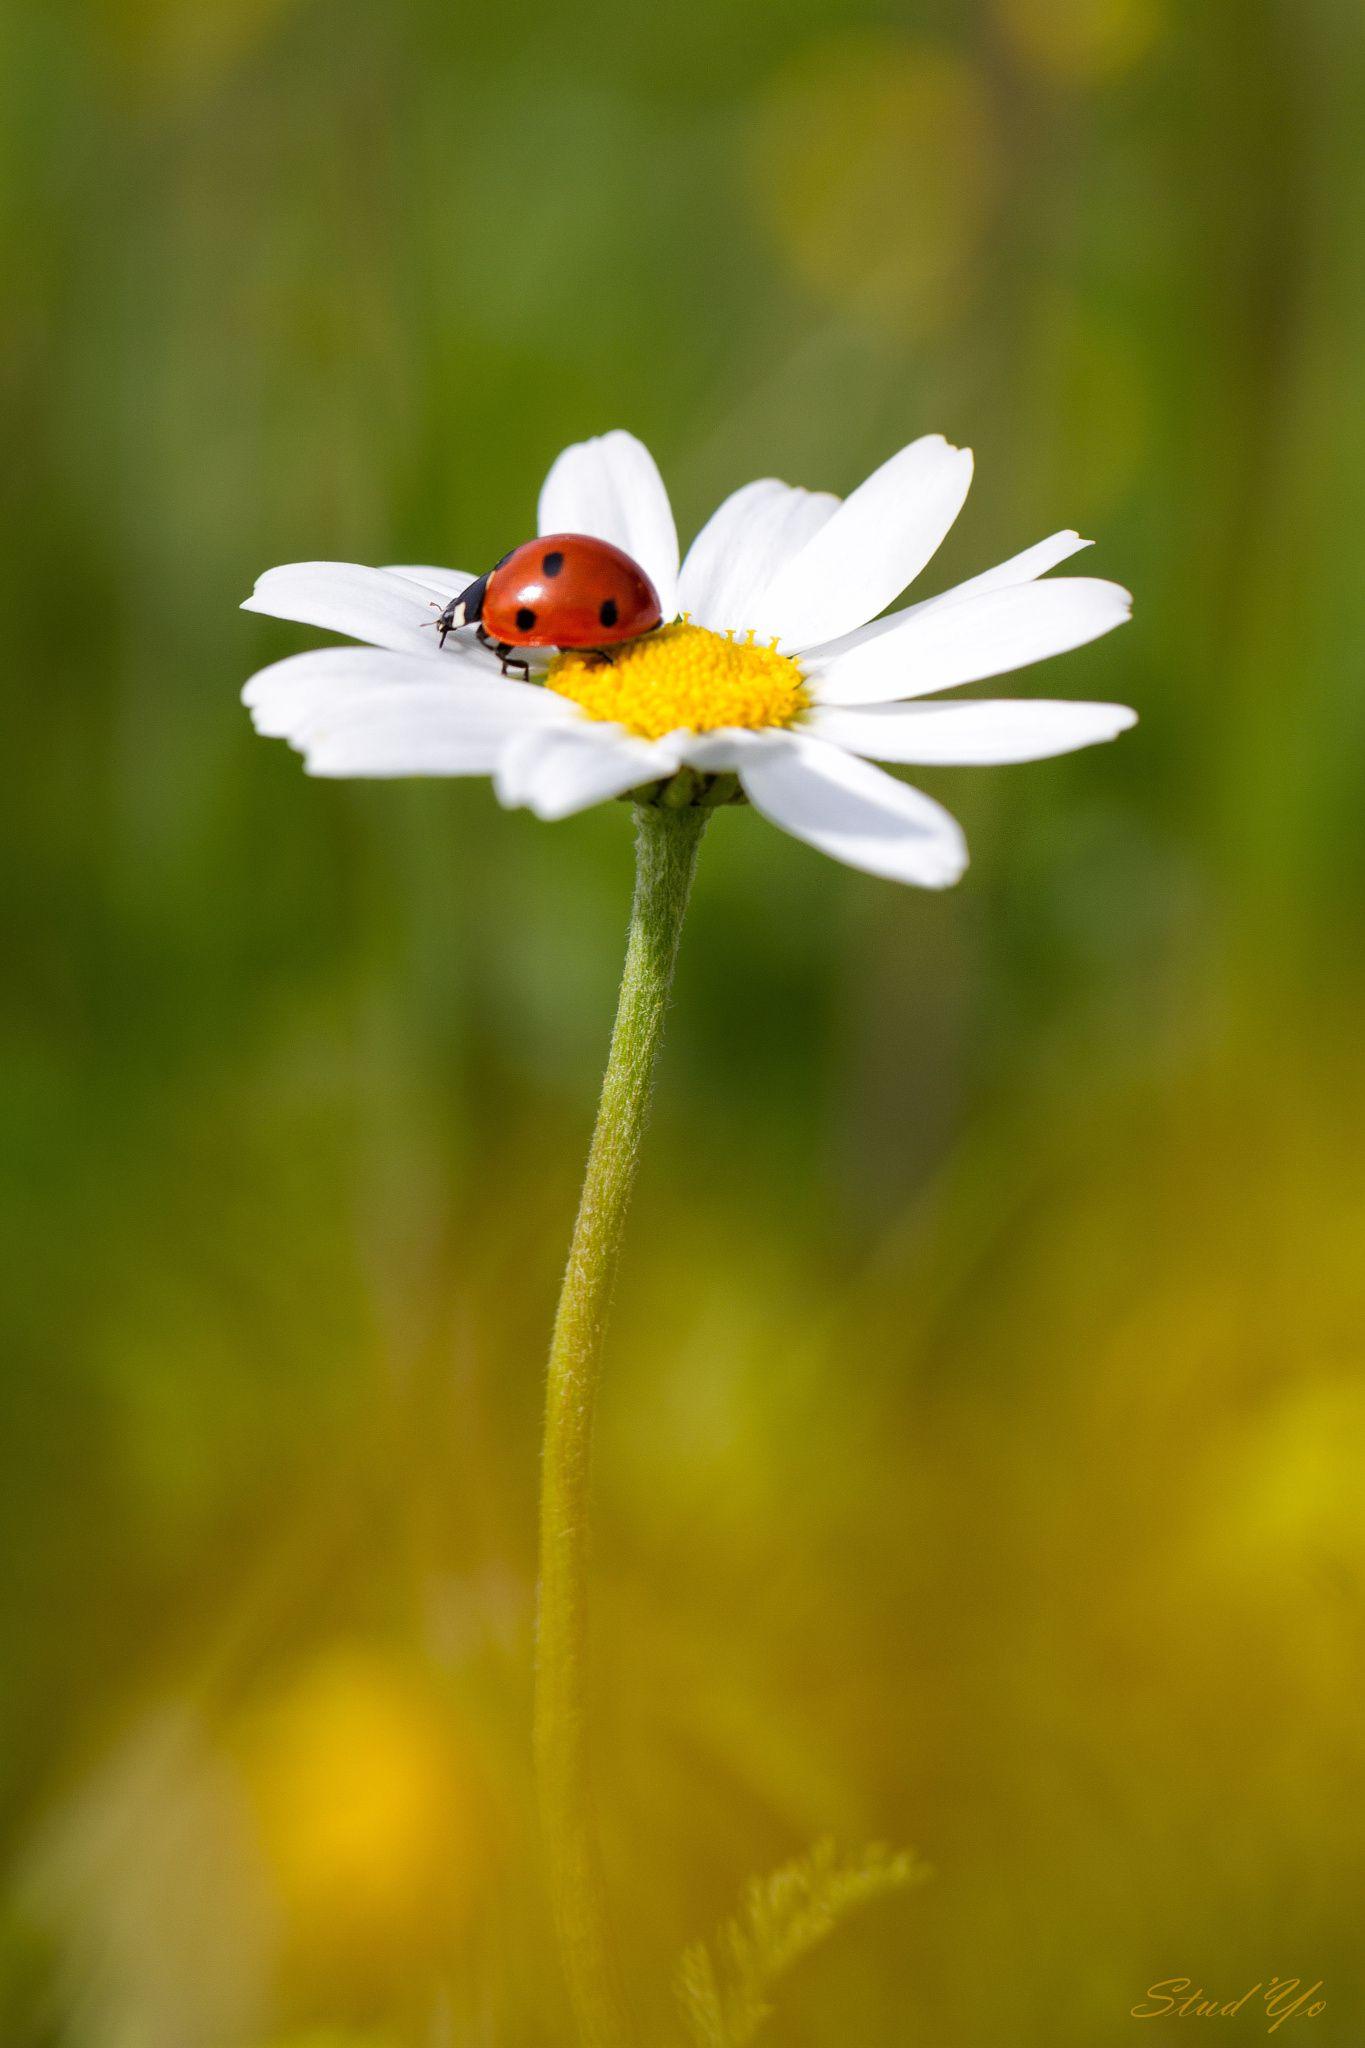 Madame Ladybird sur sa fleur.